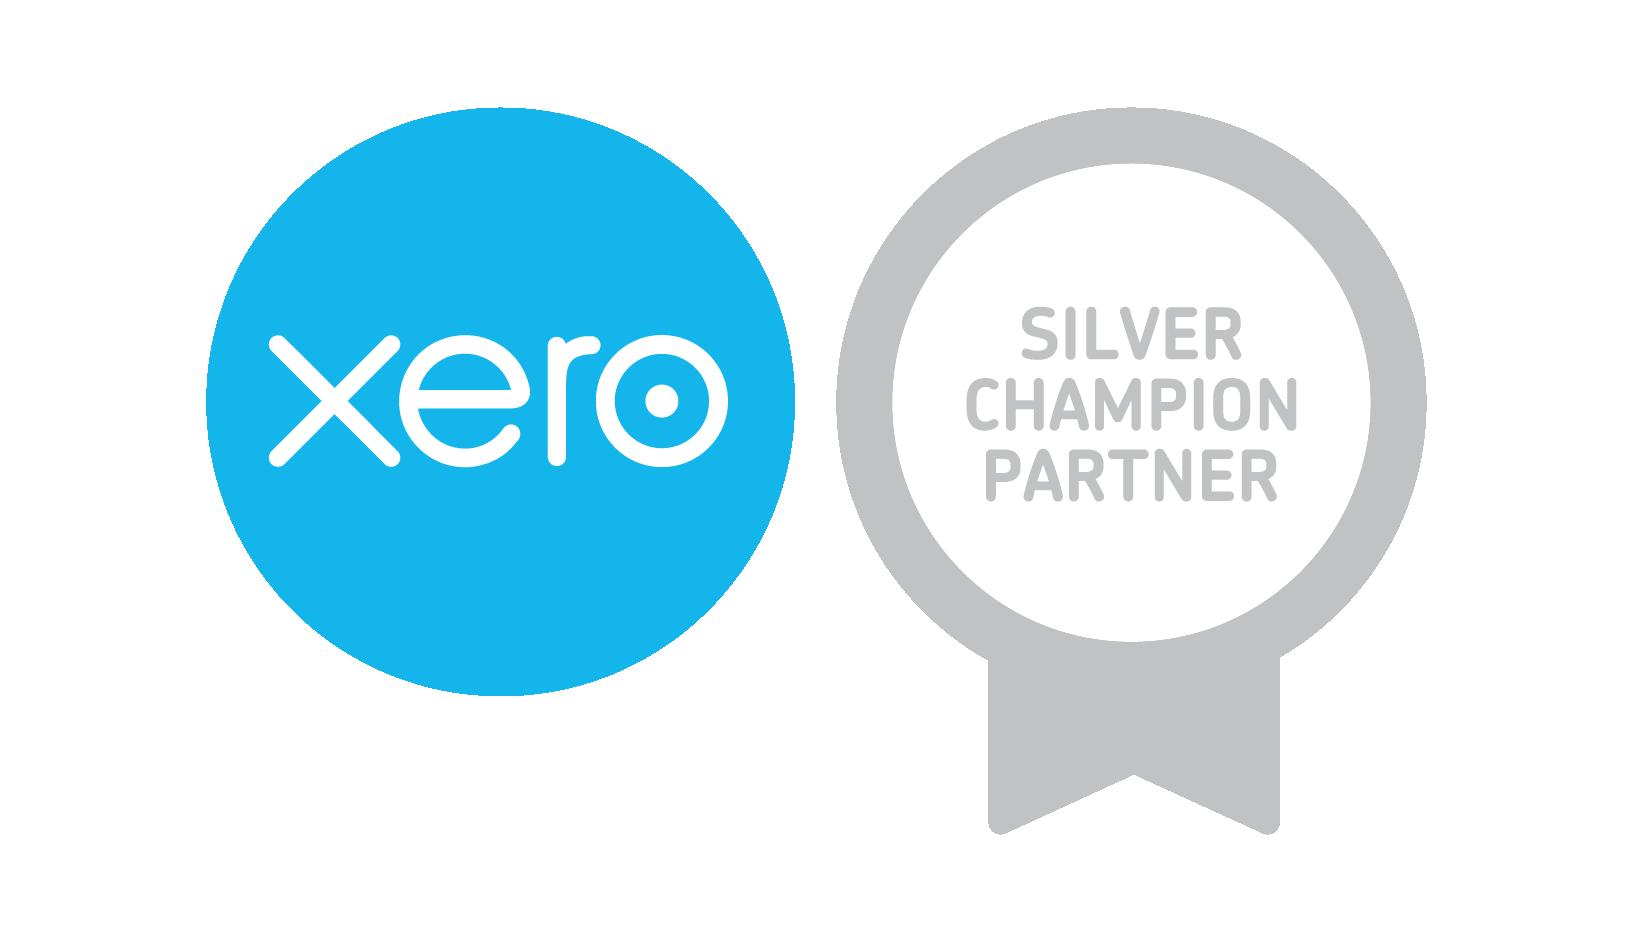 xero-champion-silver-partner-badge-RGB